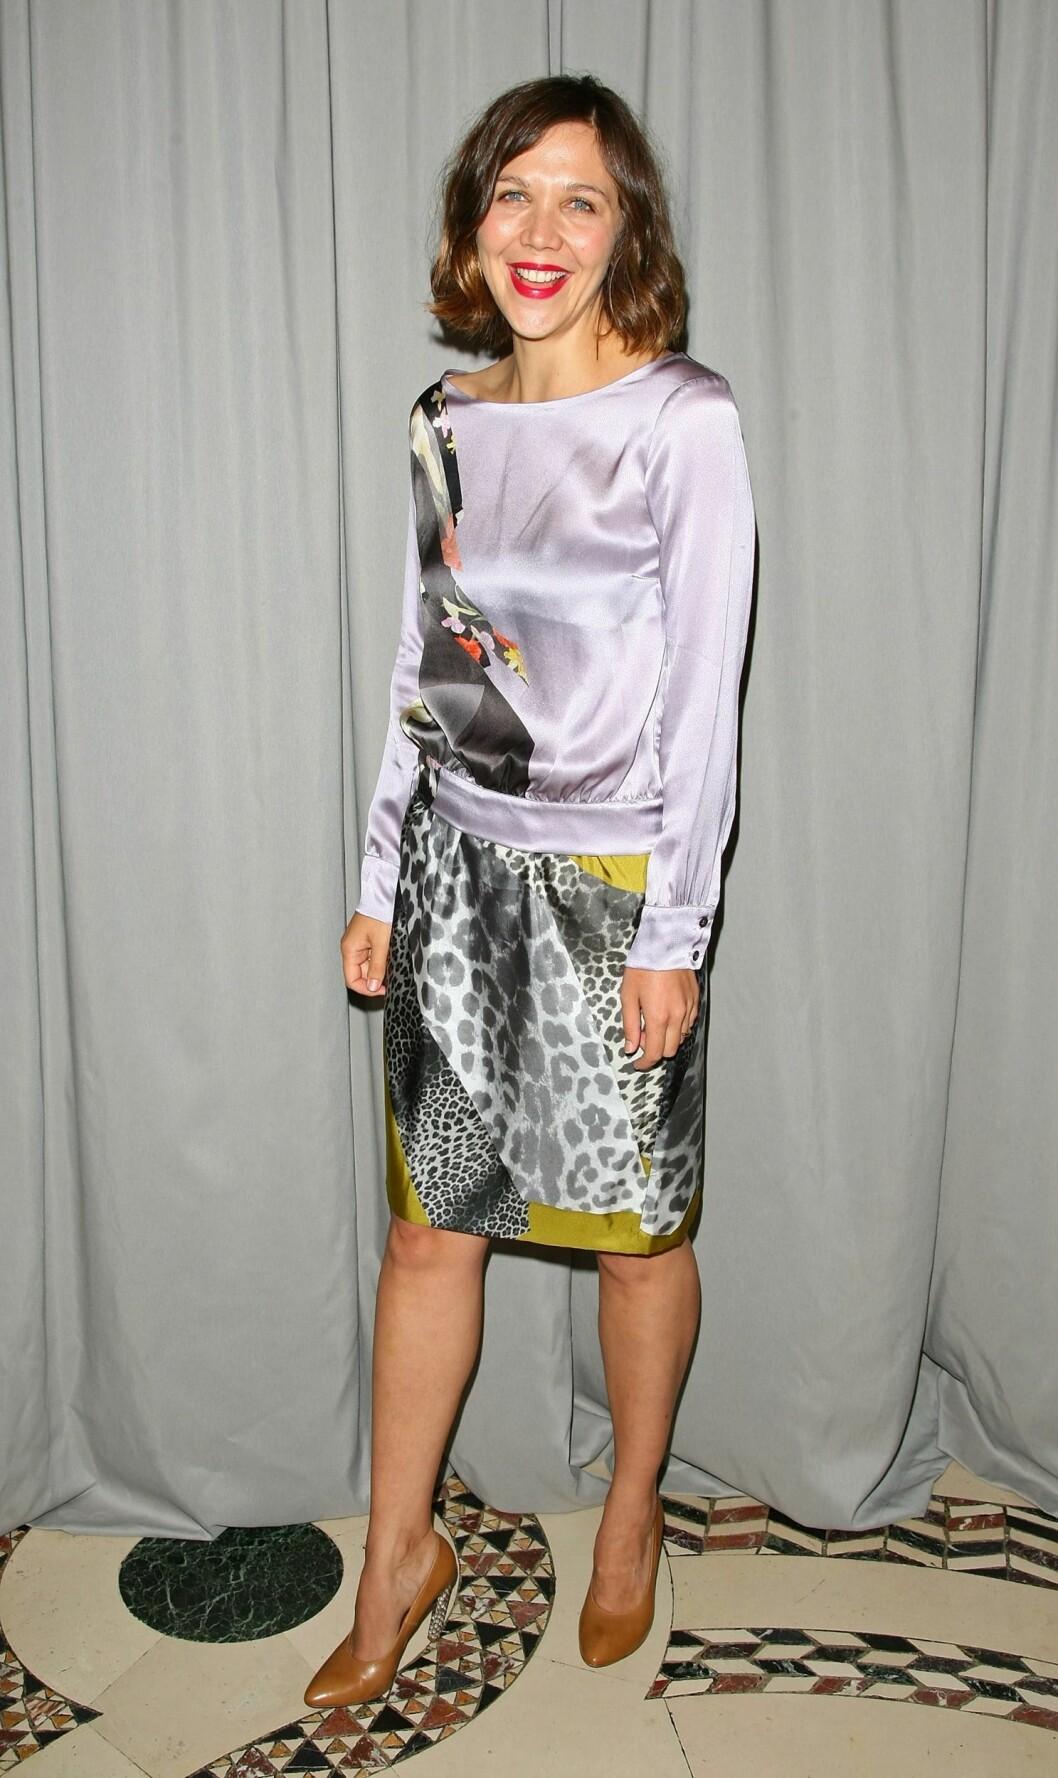 Casual i silkekjole på FITs Fashion Awards. Foto: All Over Press